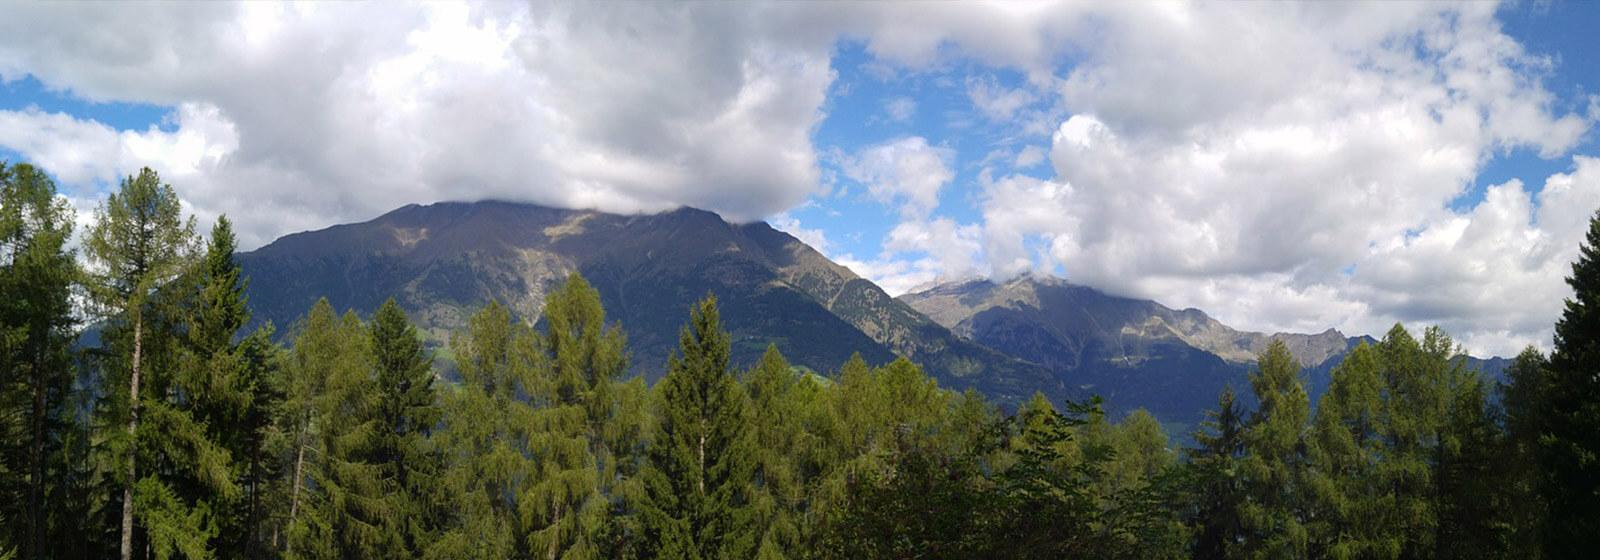 Mountains image slide